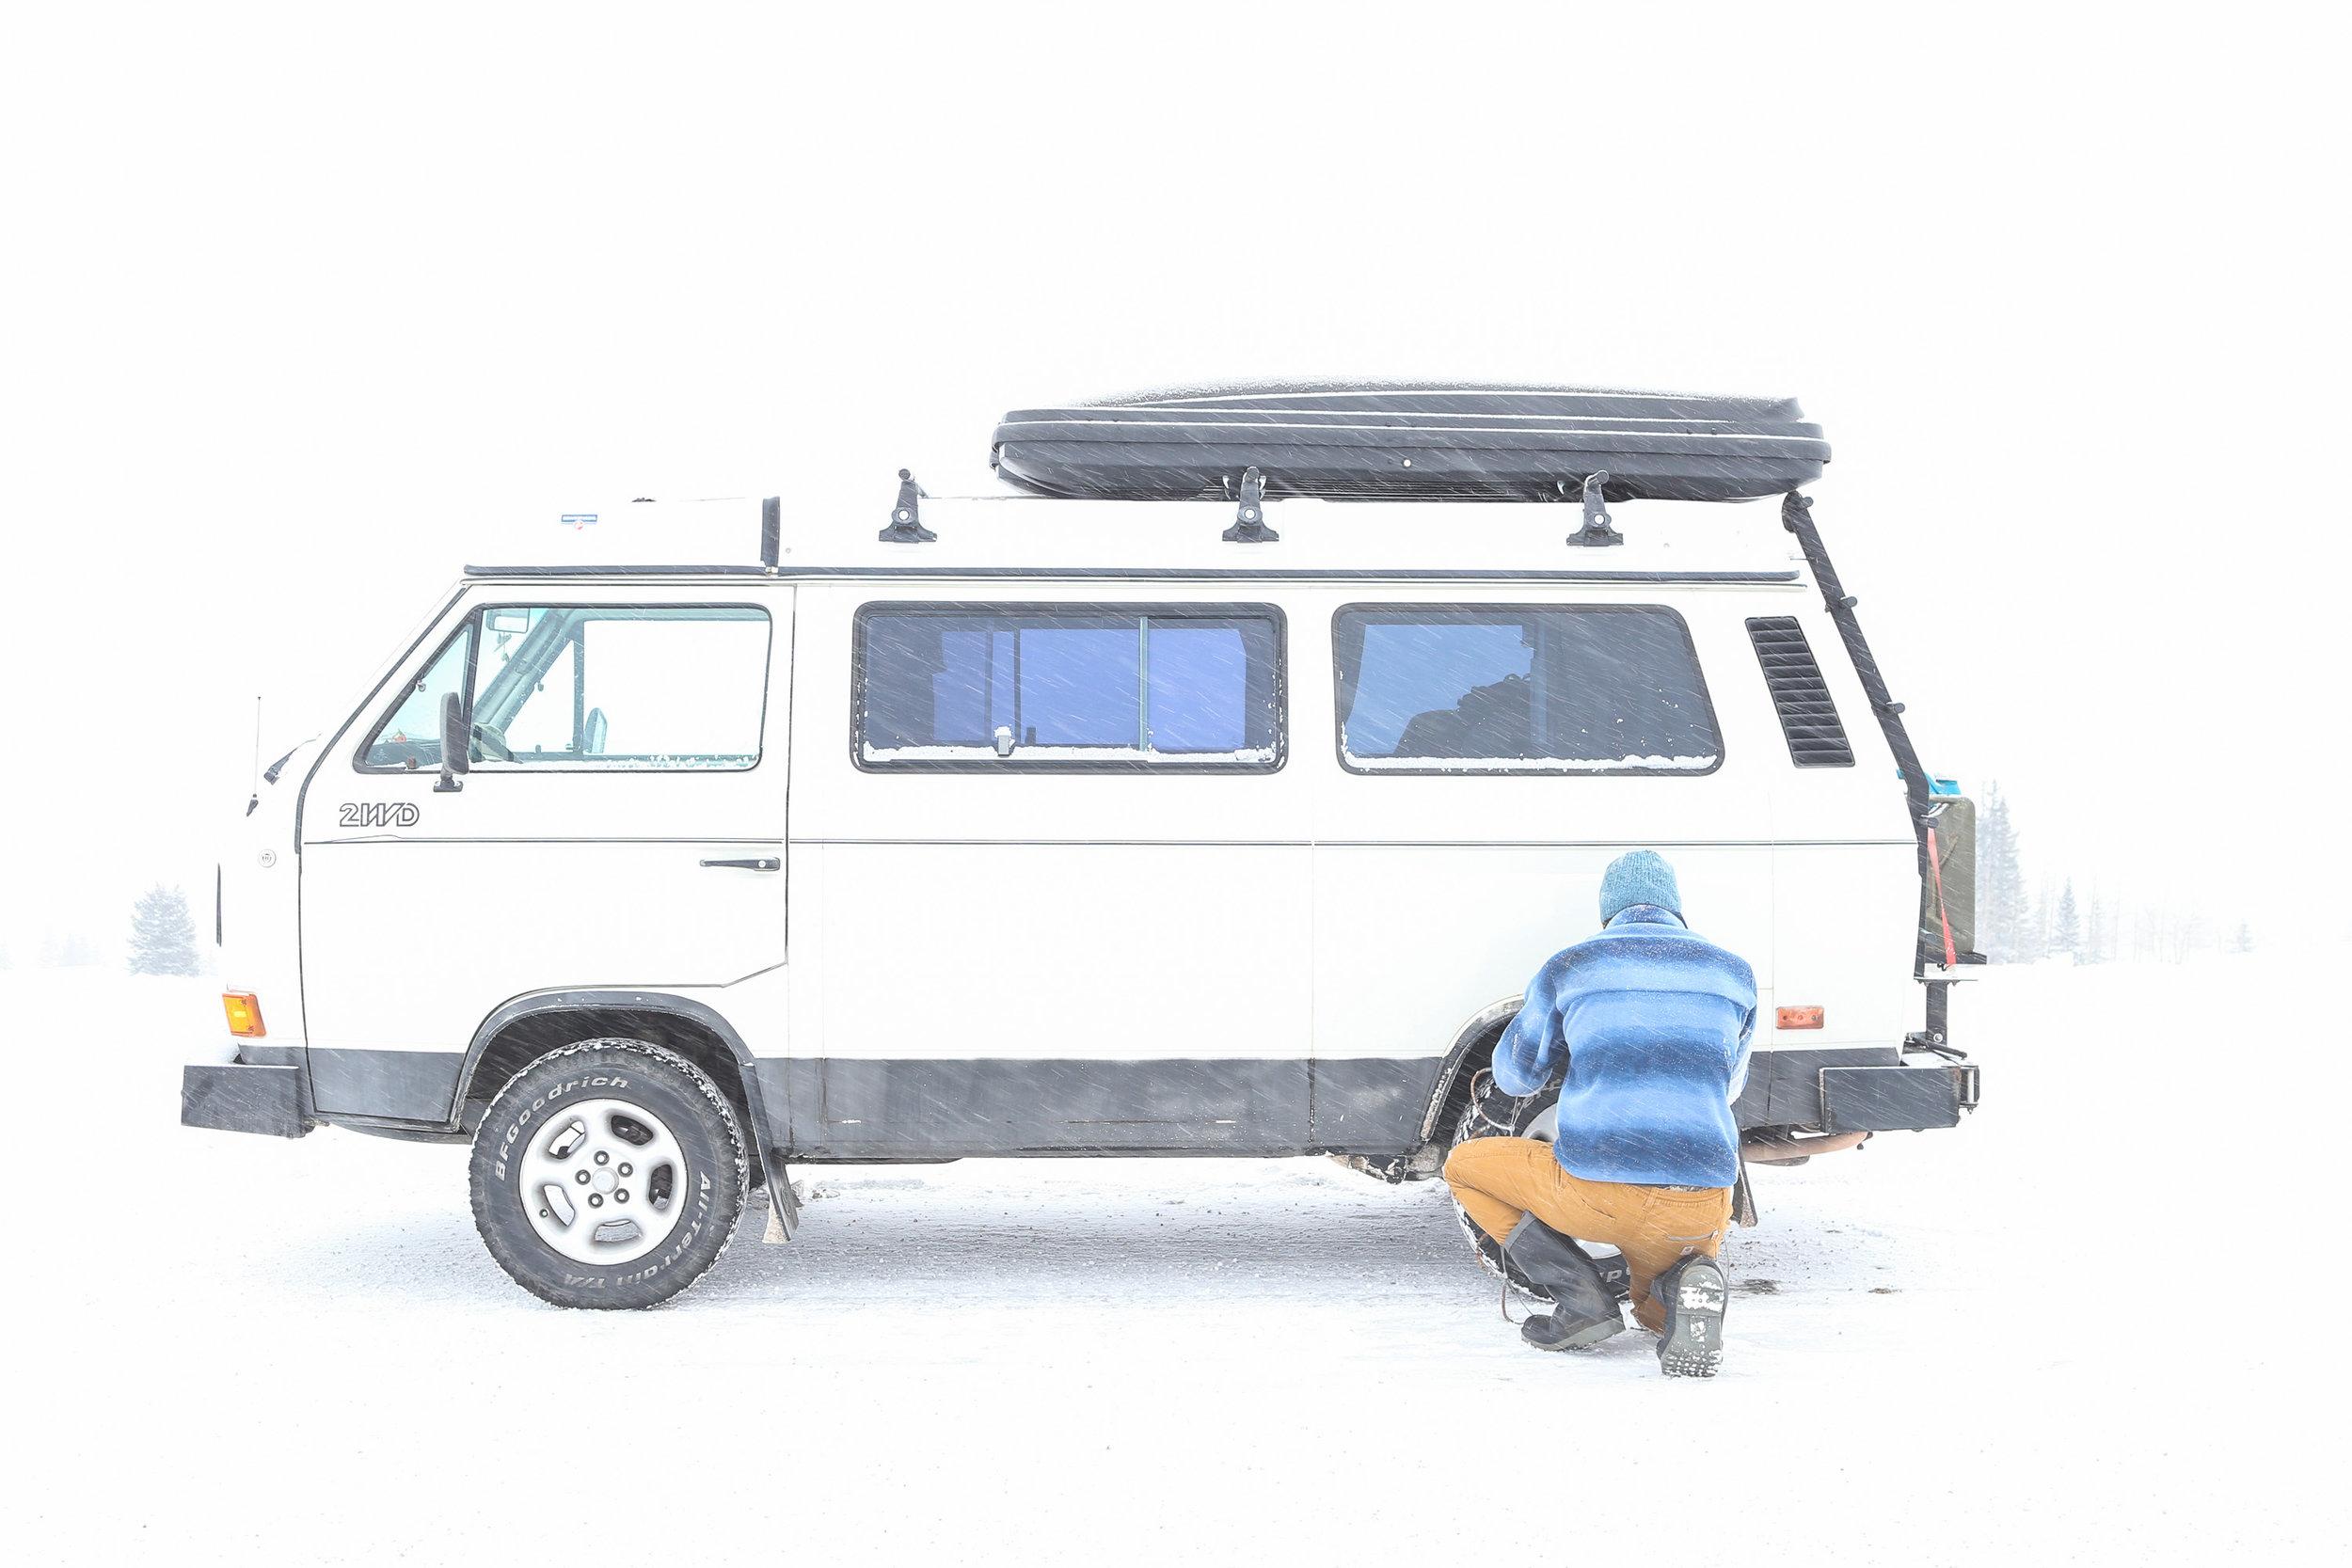 vanlife-not-answer-peak-design-63mph-travel-explore-32.jpg